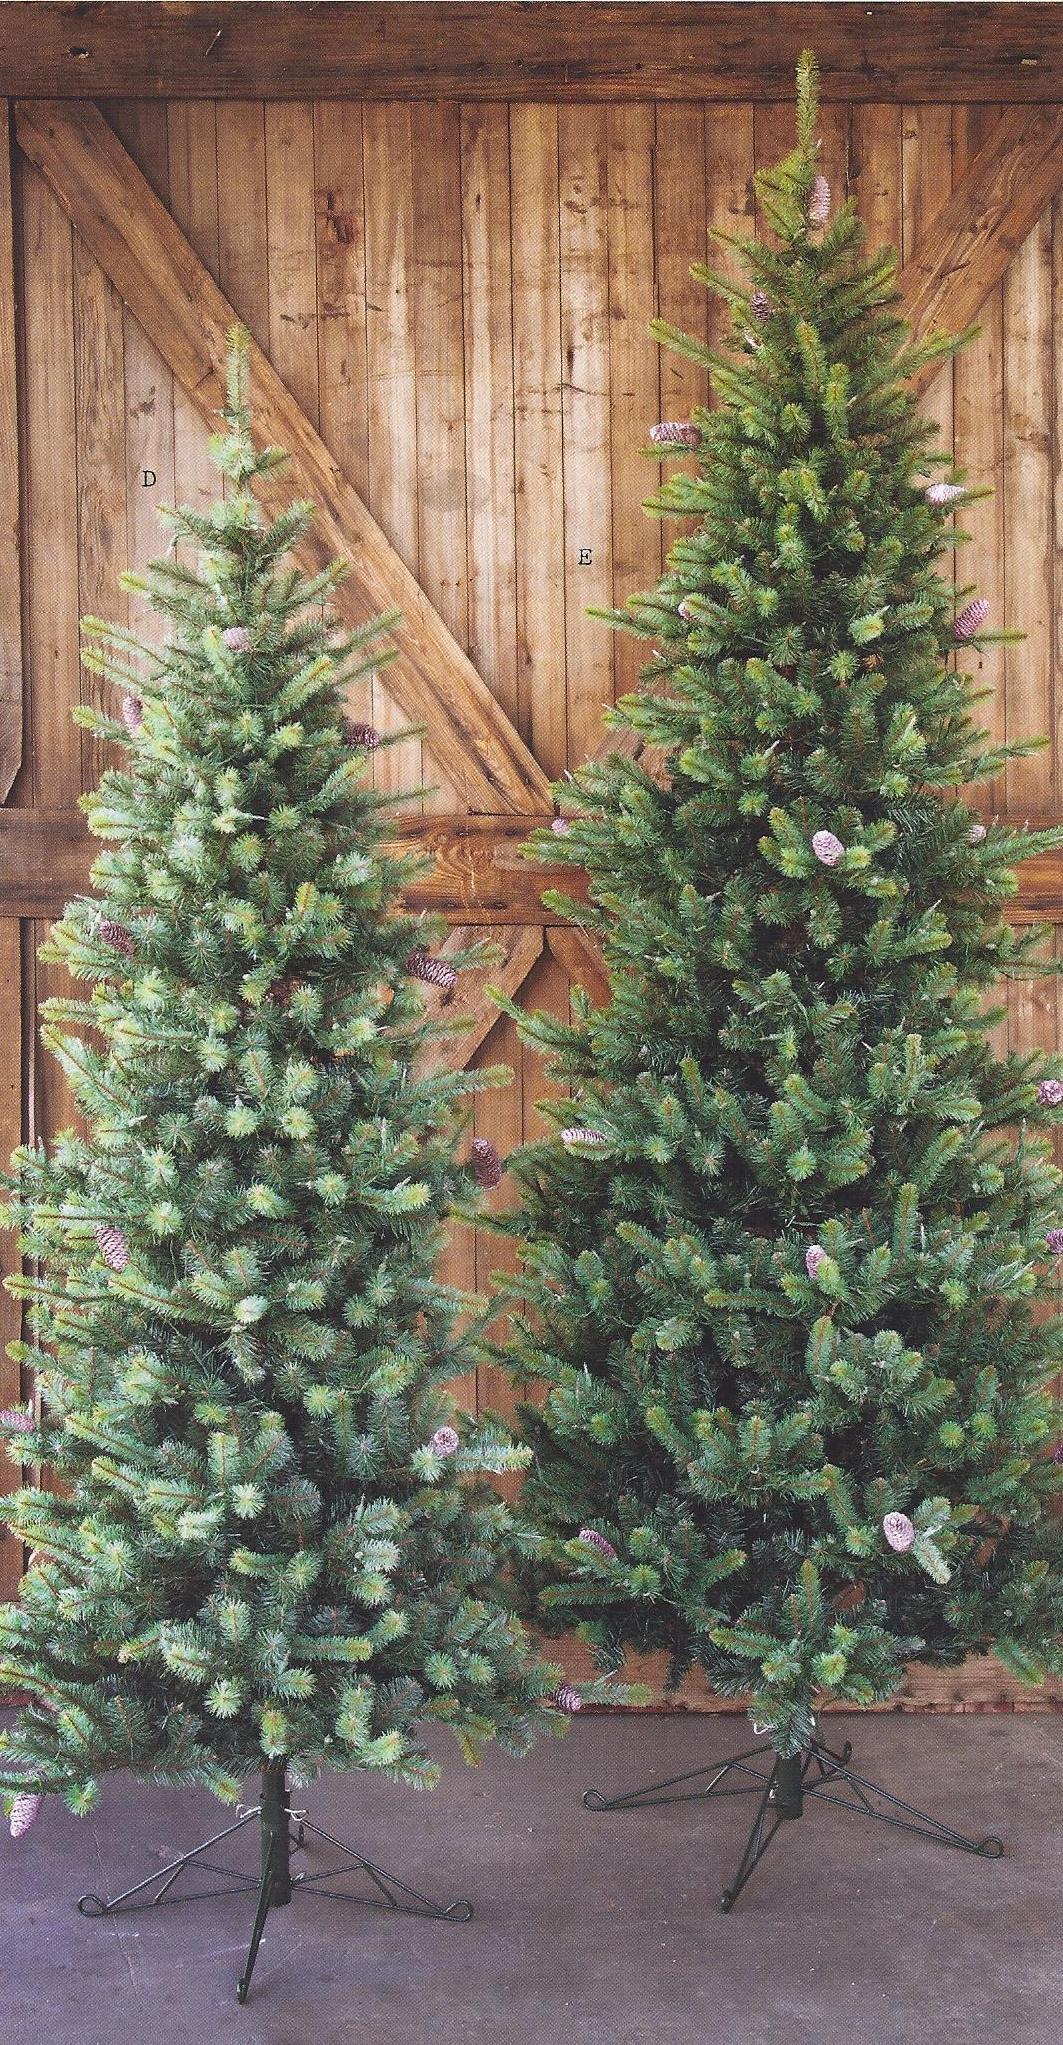 Christmas.trees.undecorated.providence.ltd.design.jpg